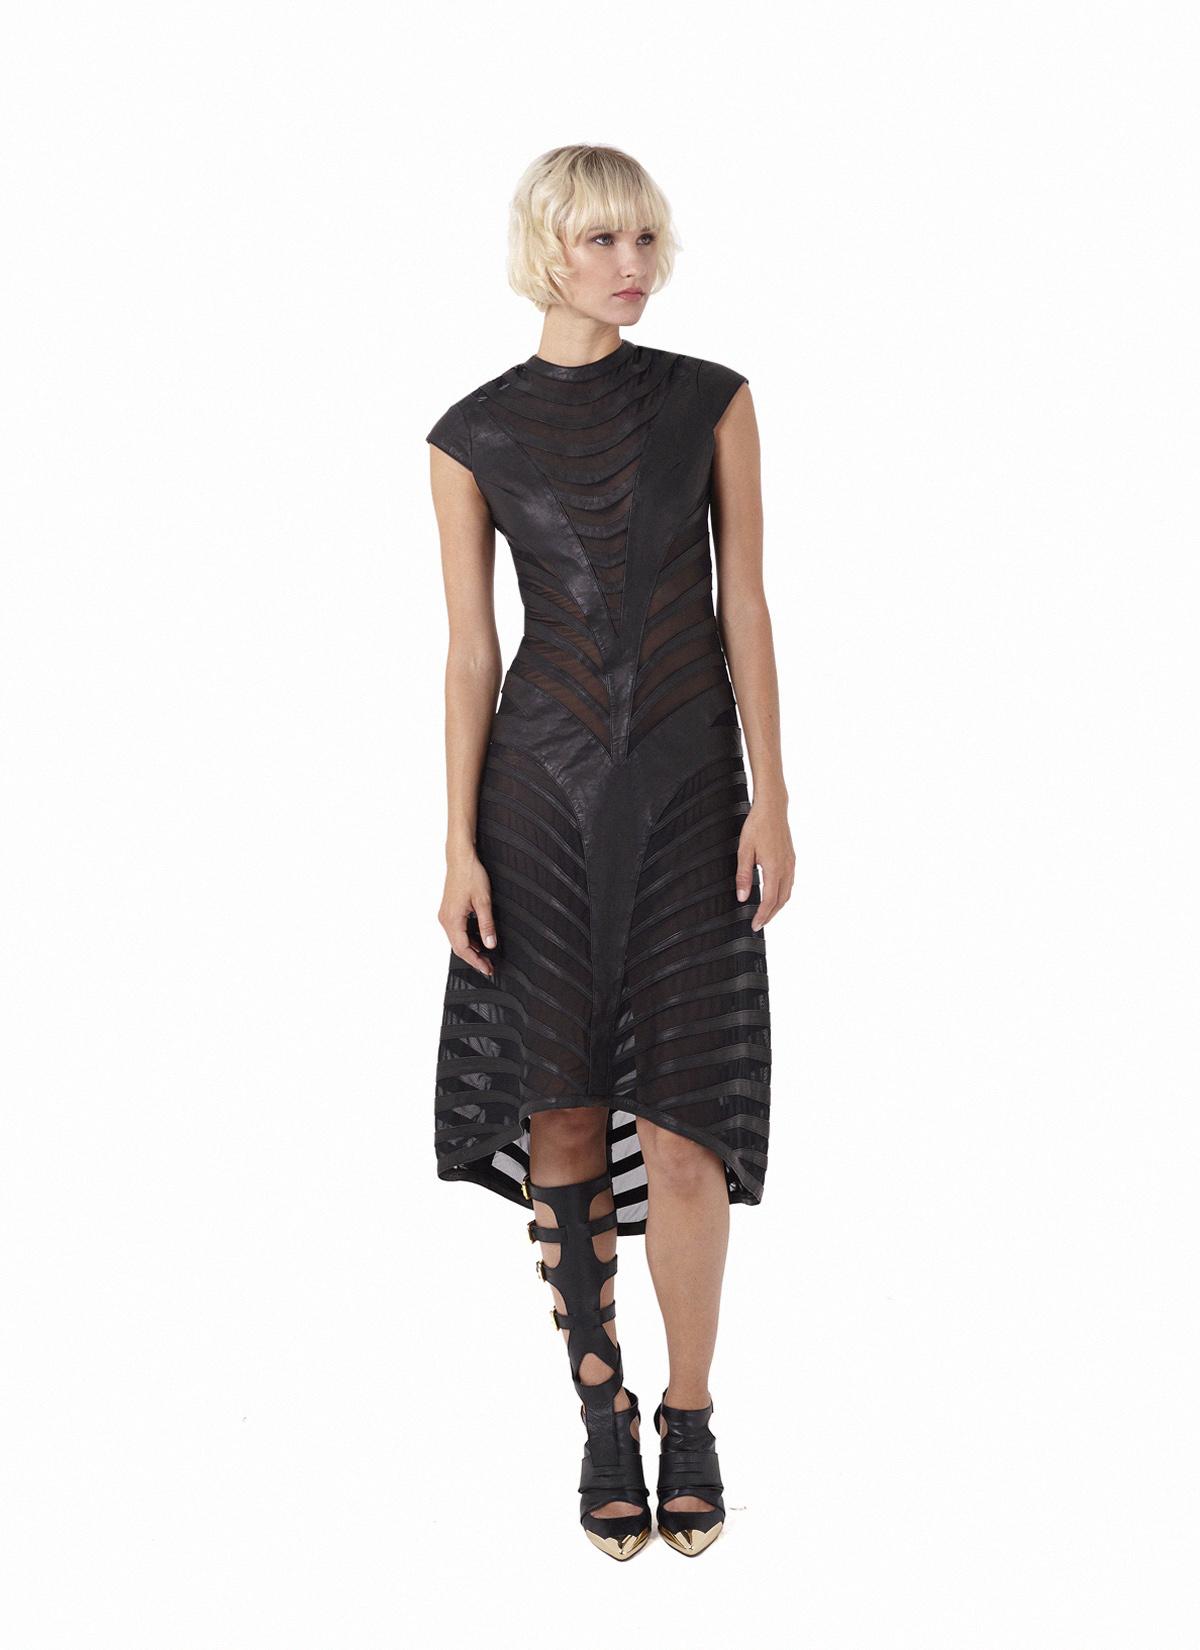 Onyx banded dress